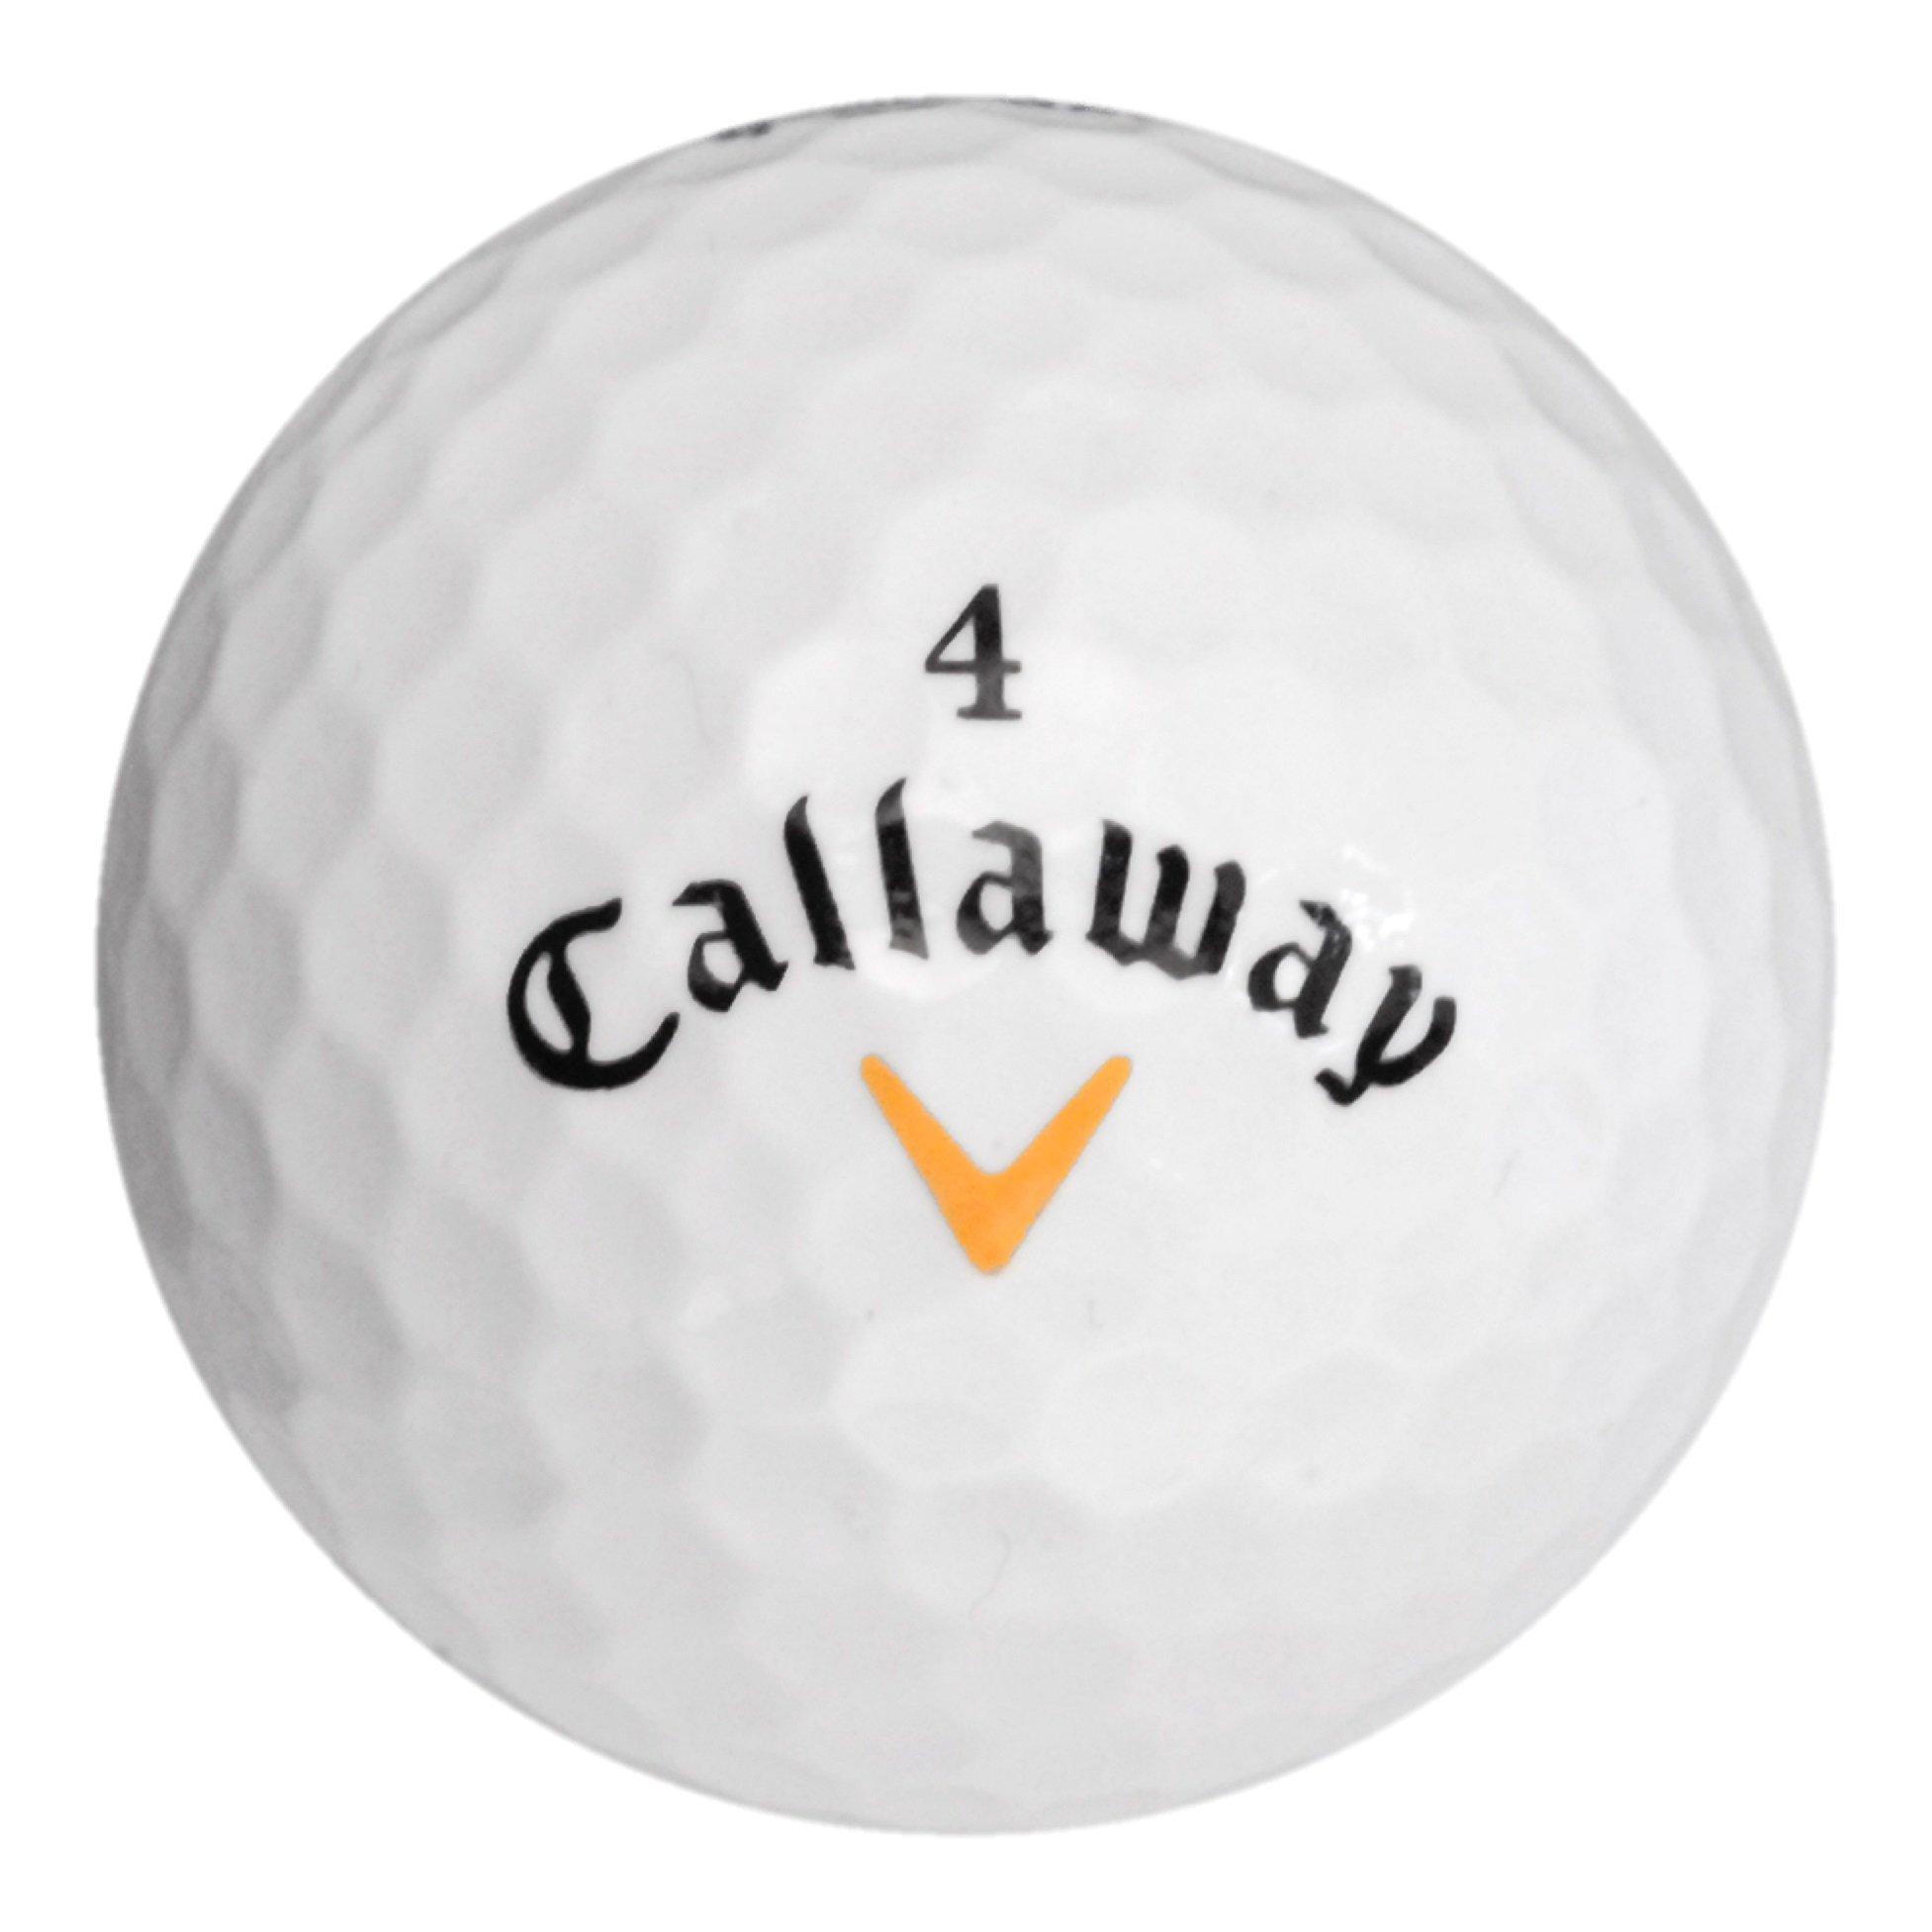 132 Callaway Warbird - Value (AAA) Grade - Recycled (Used) Golf Balls by Callaway (Image #4)